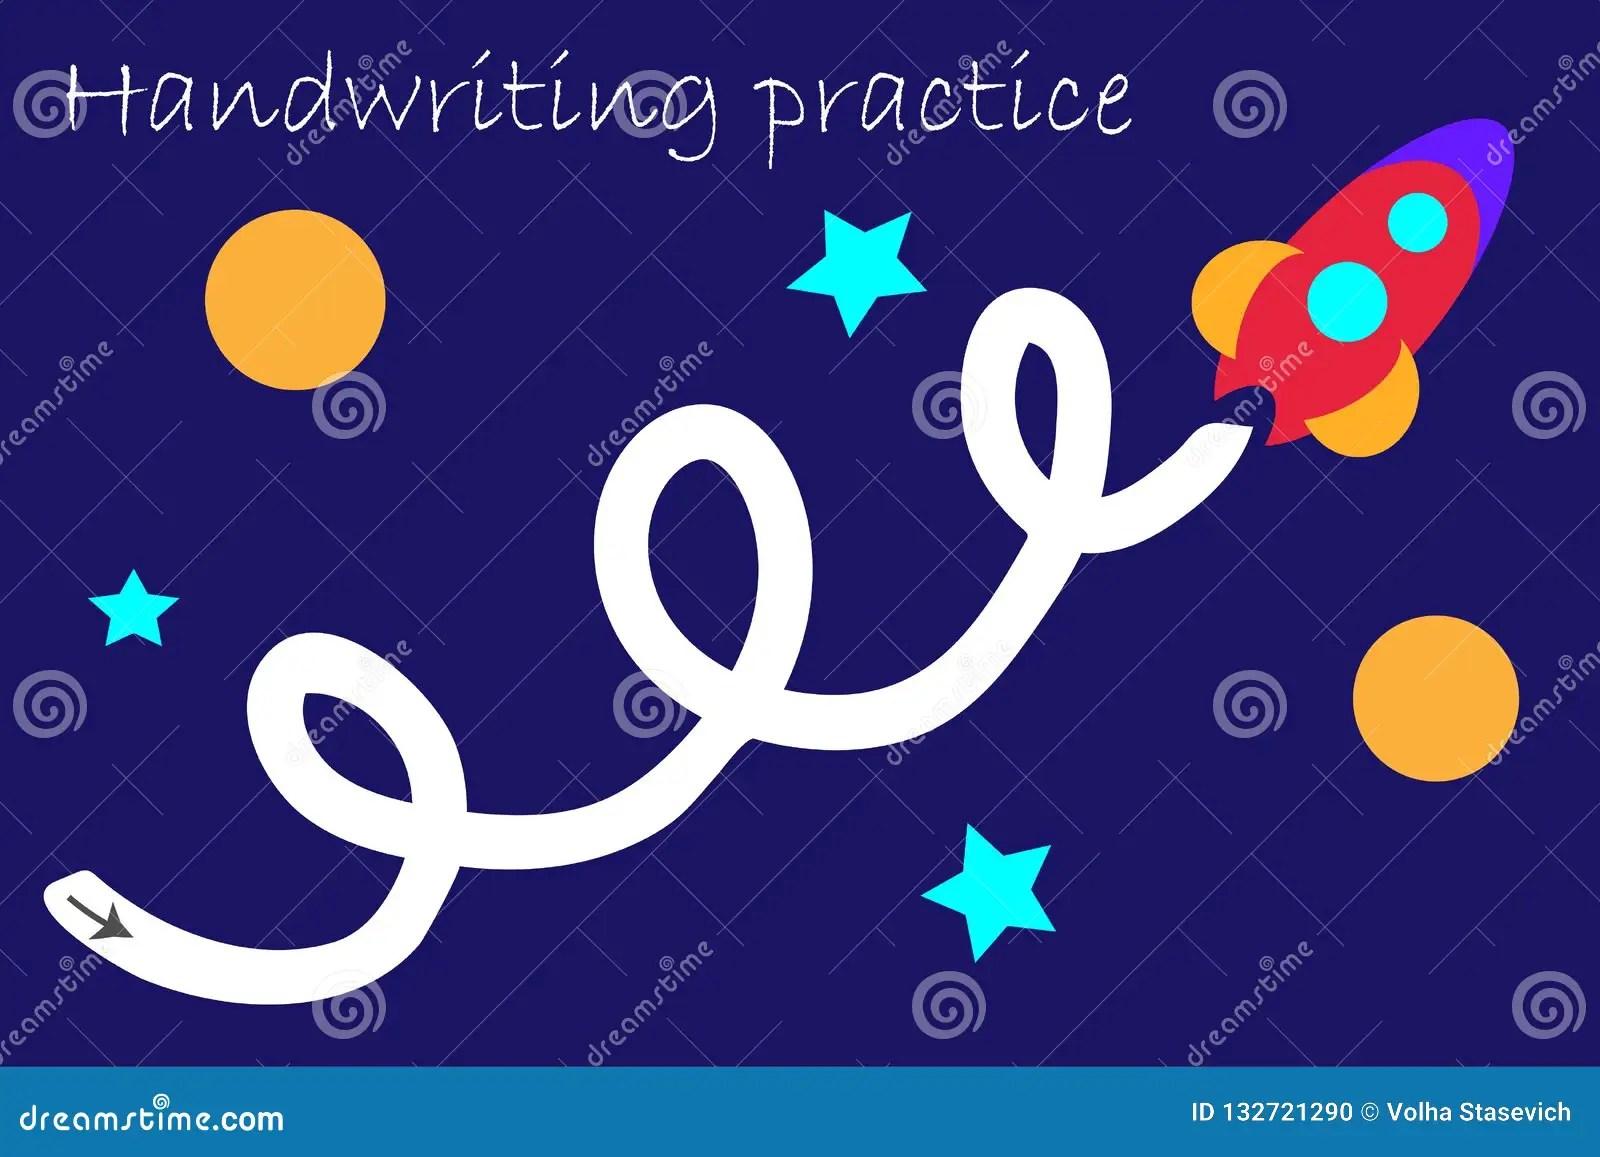 Draw Track Of Rocket Handwriting Practice Sheet Kids